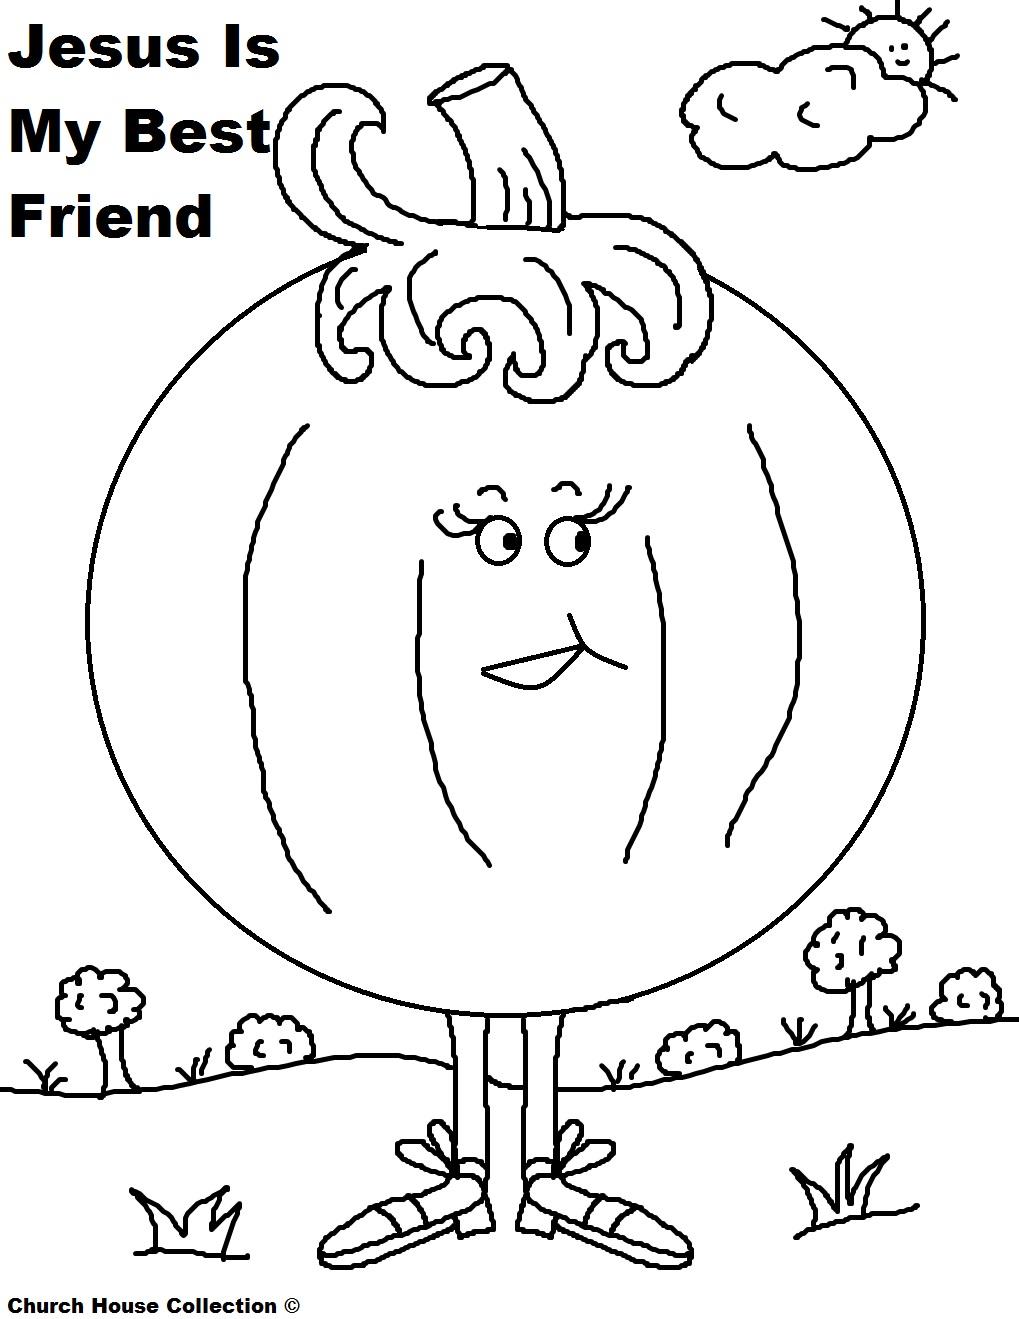 pumpkin coloring page jesus is my best friend